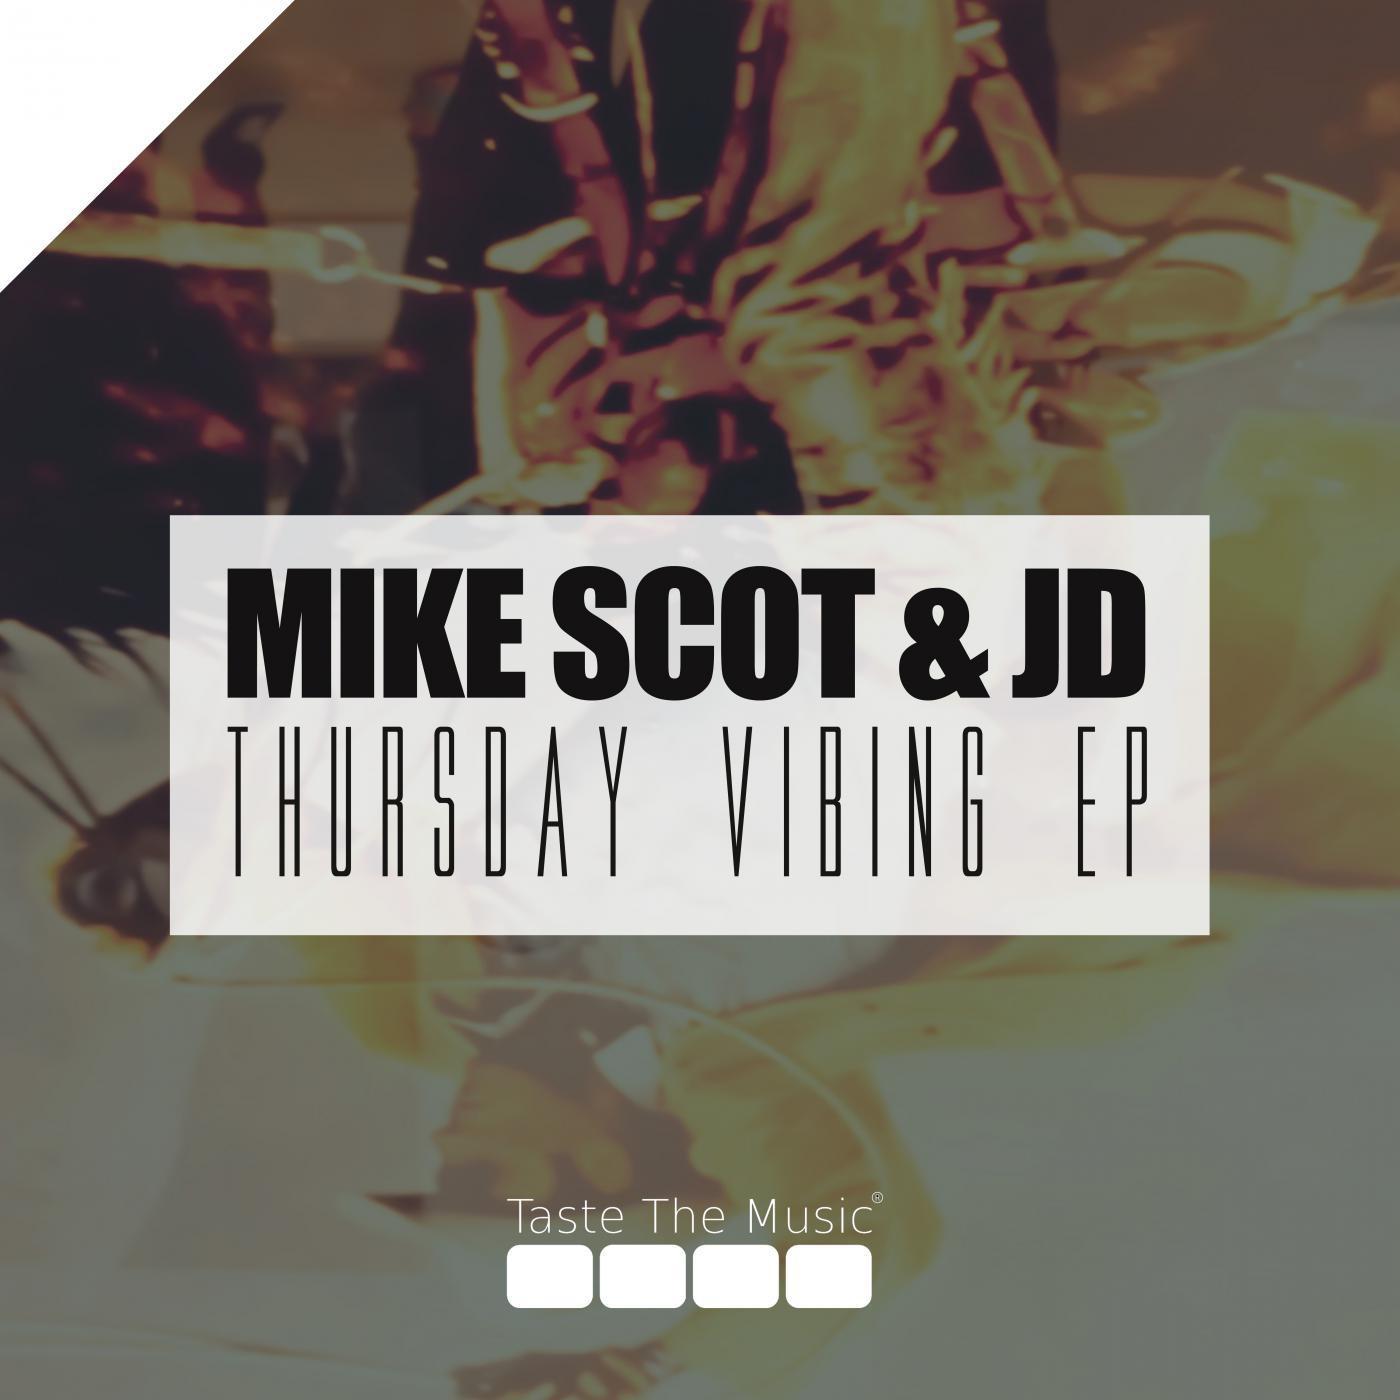 Mike Scot & JD - Ultrafunkular (Original Mix)